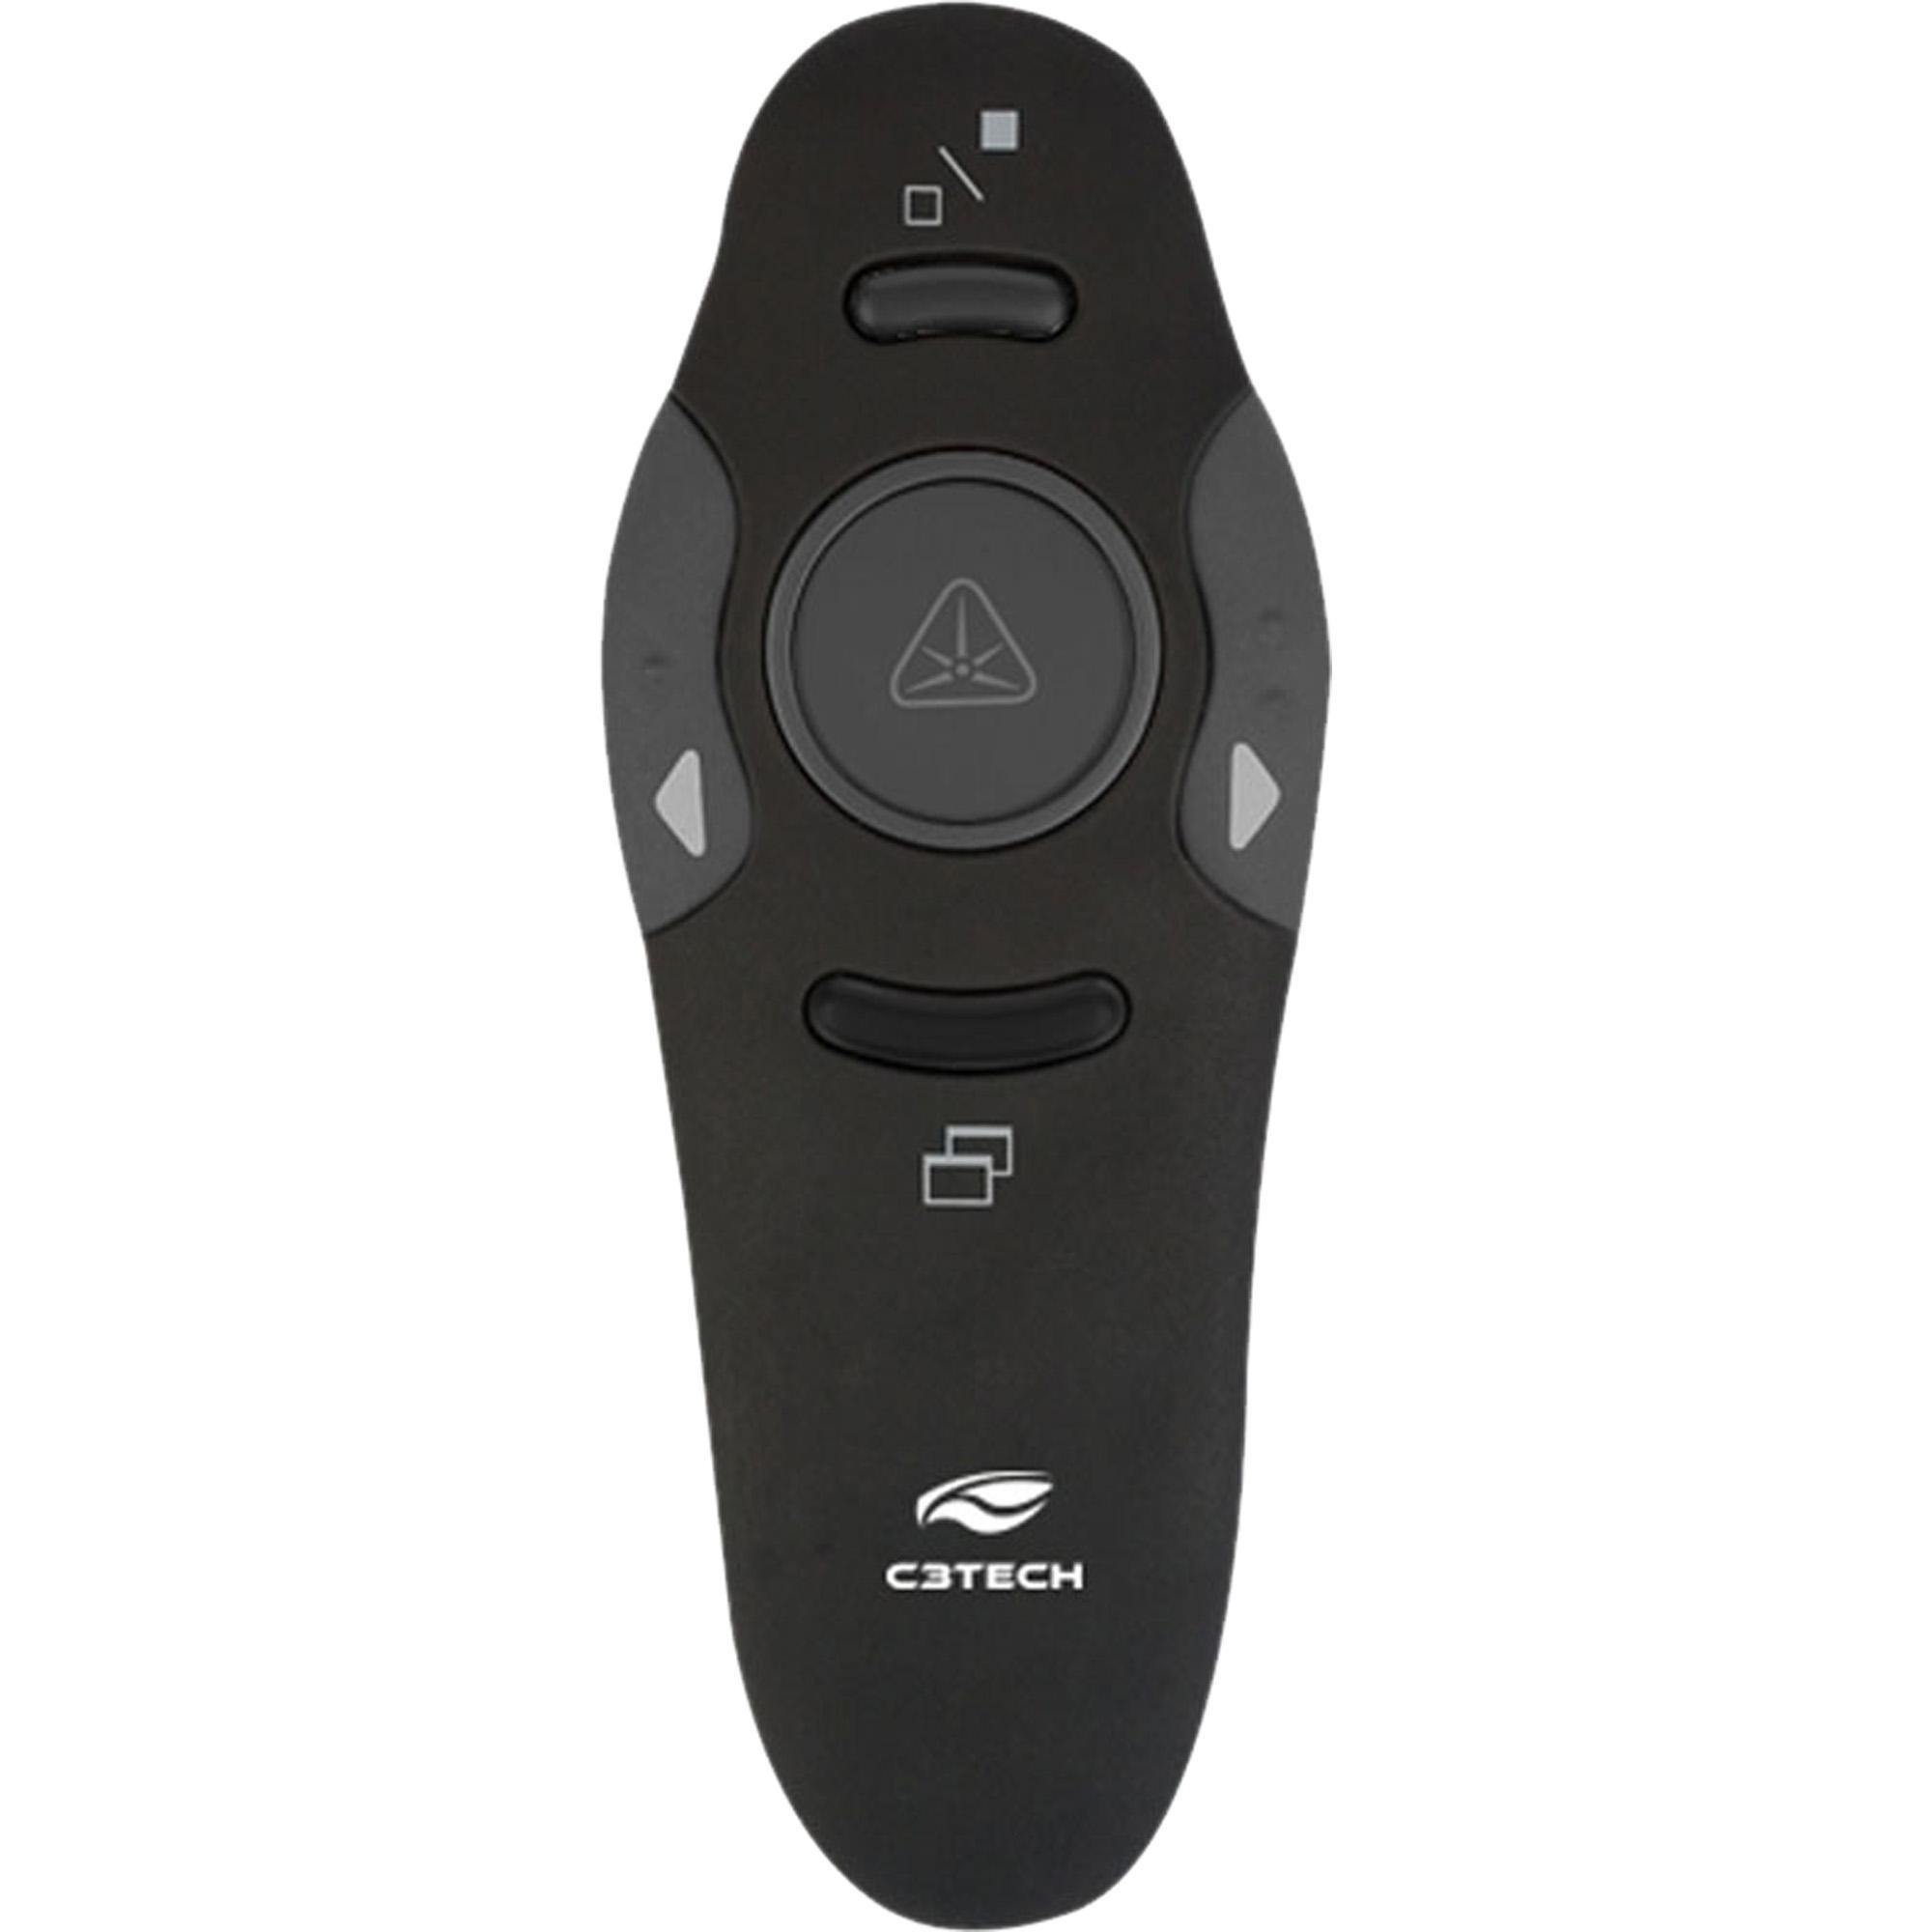 Apresentador Laser Wireless AP-400 Preto C3TECH